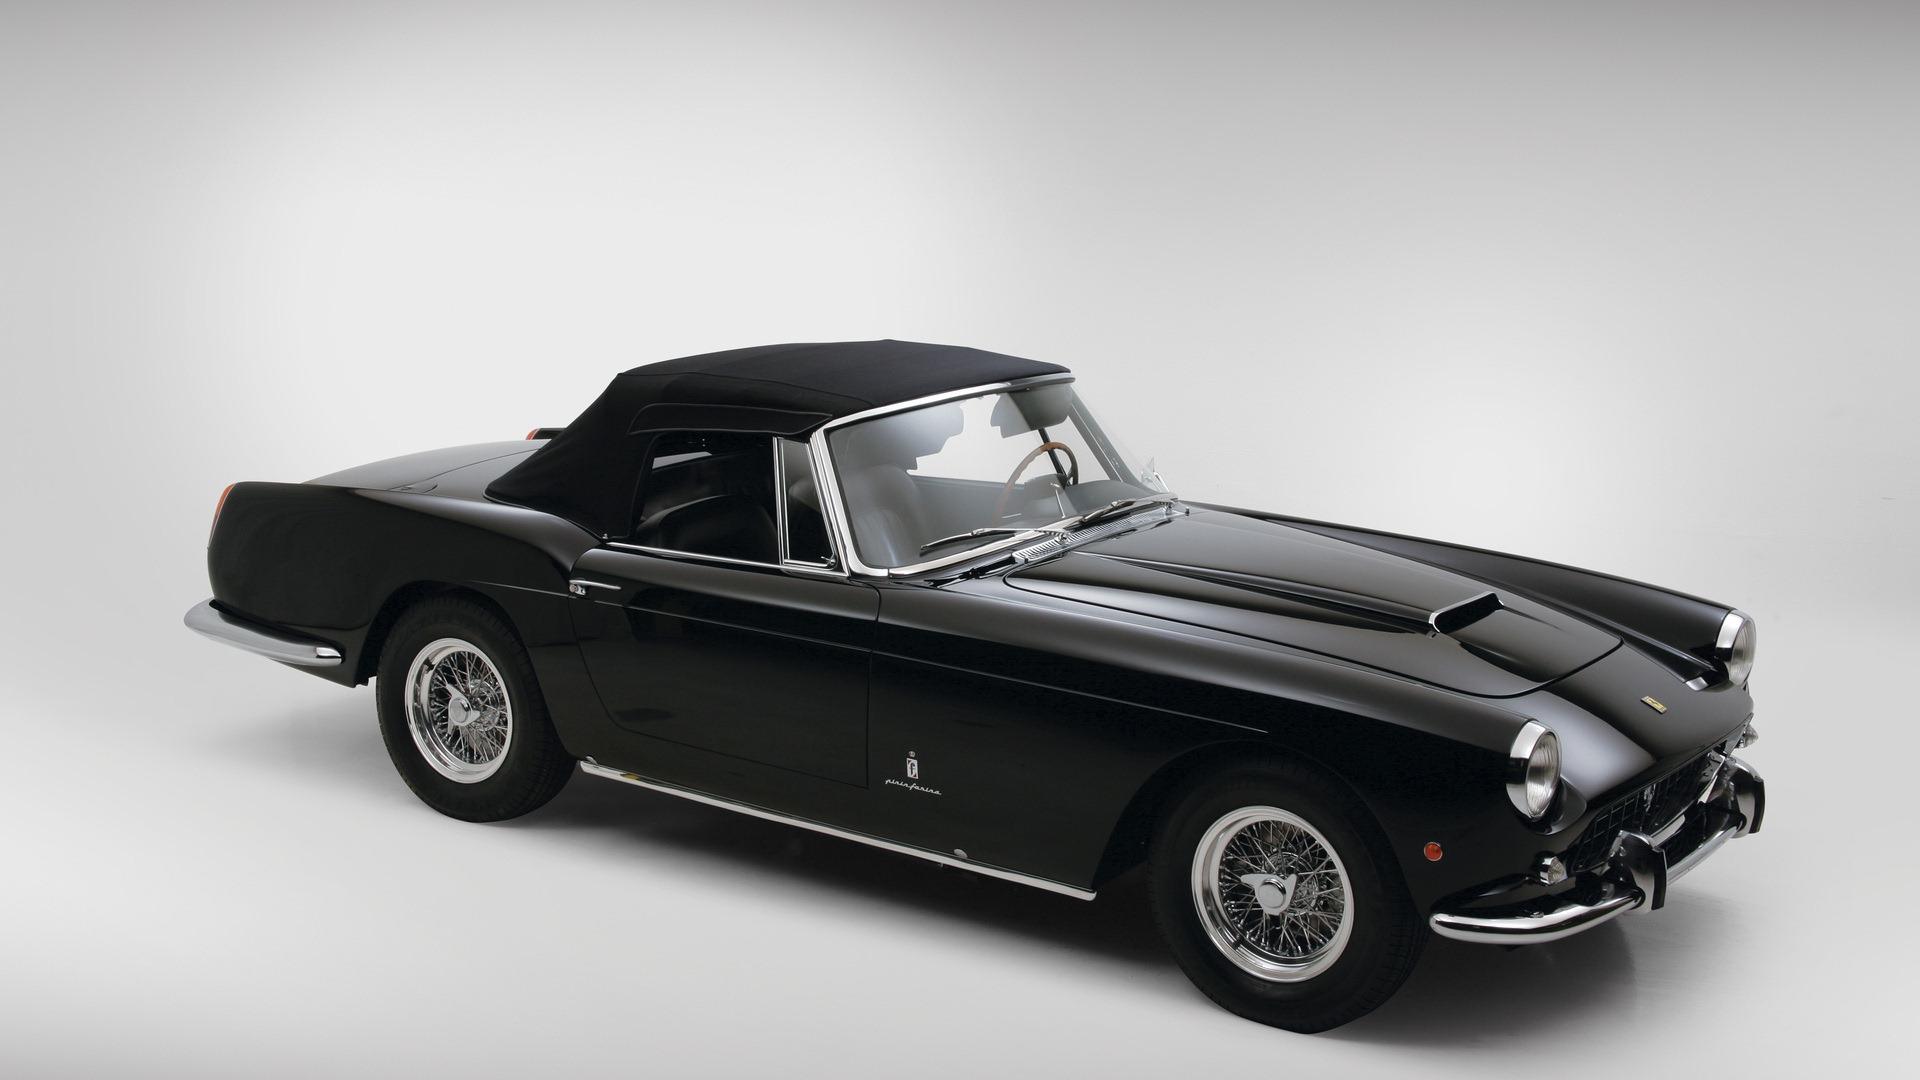 Black Classic Car Wallpapers 10 High Resolution Wallpaper ...